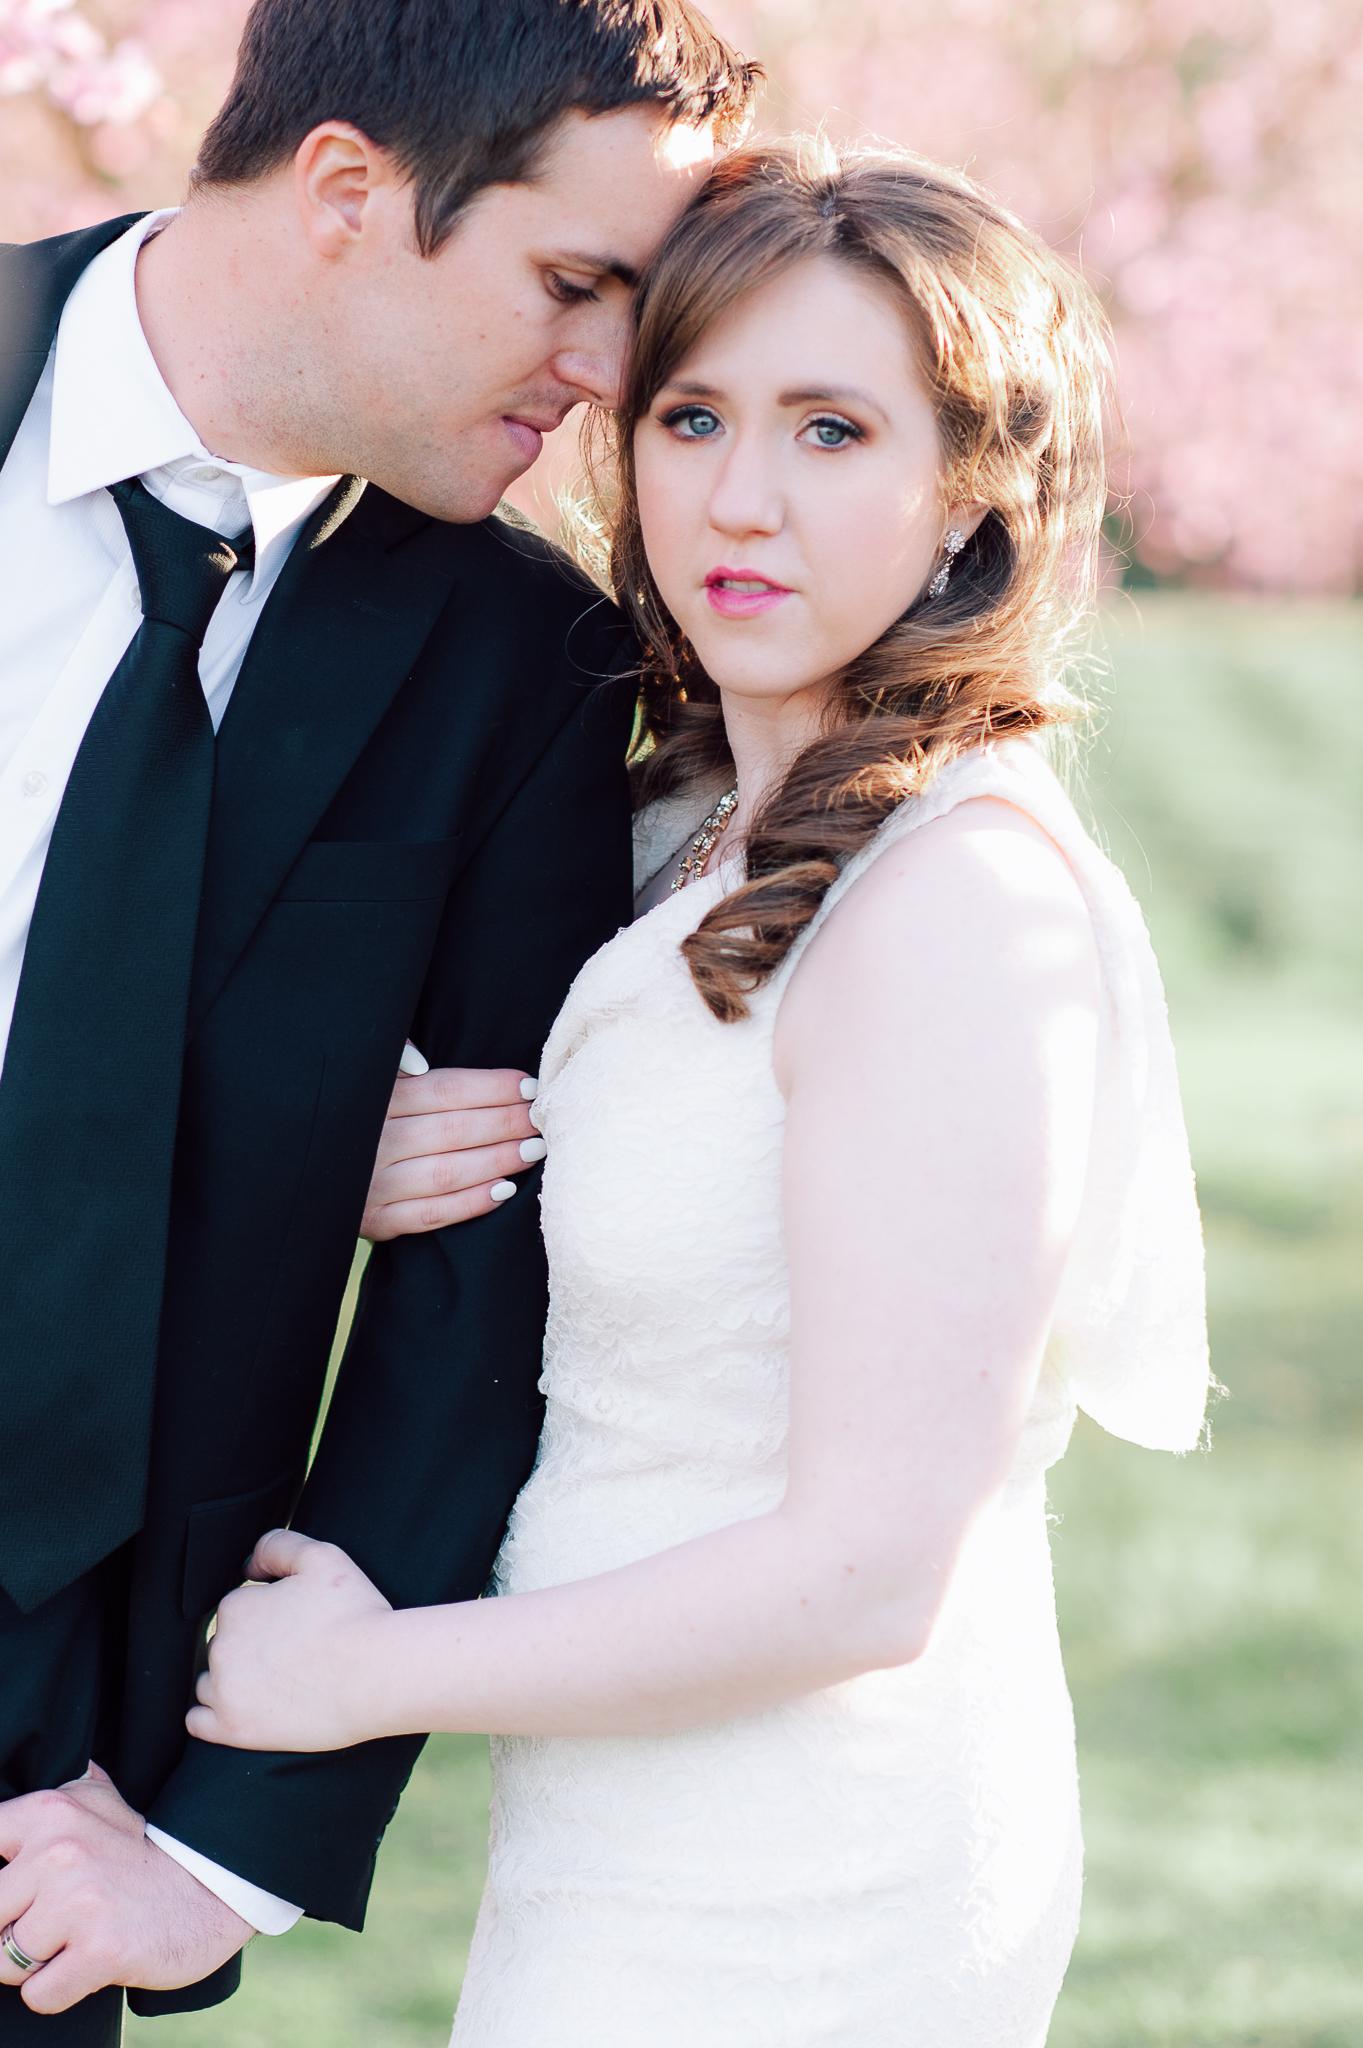 springwedding_cherryblossoms_virginiaphotographer_youseephotography_styledshoot (558).jpg